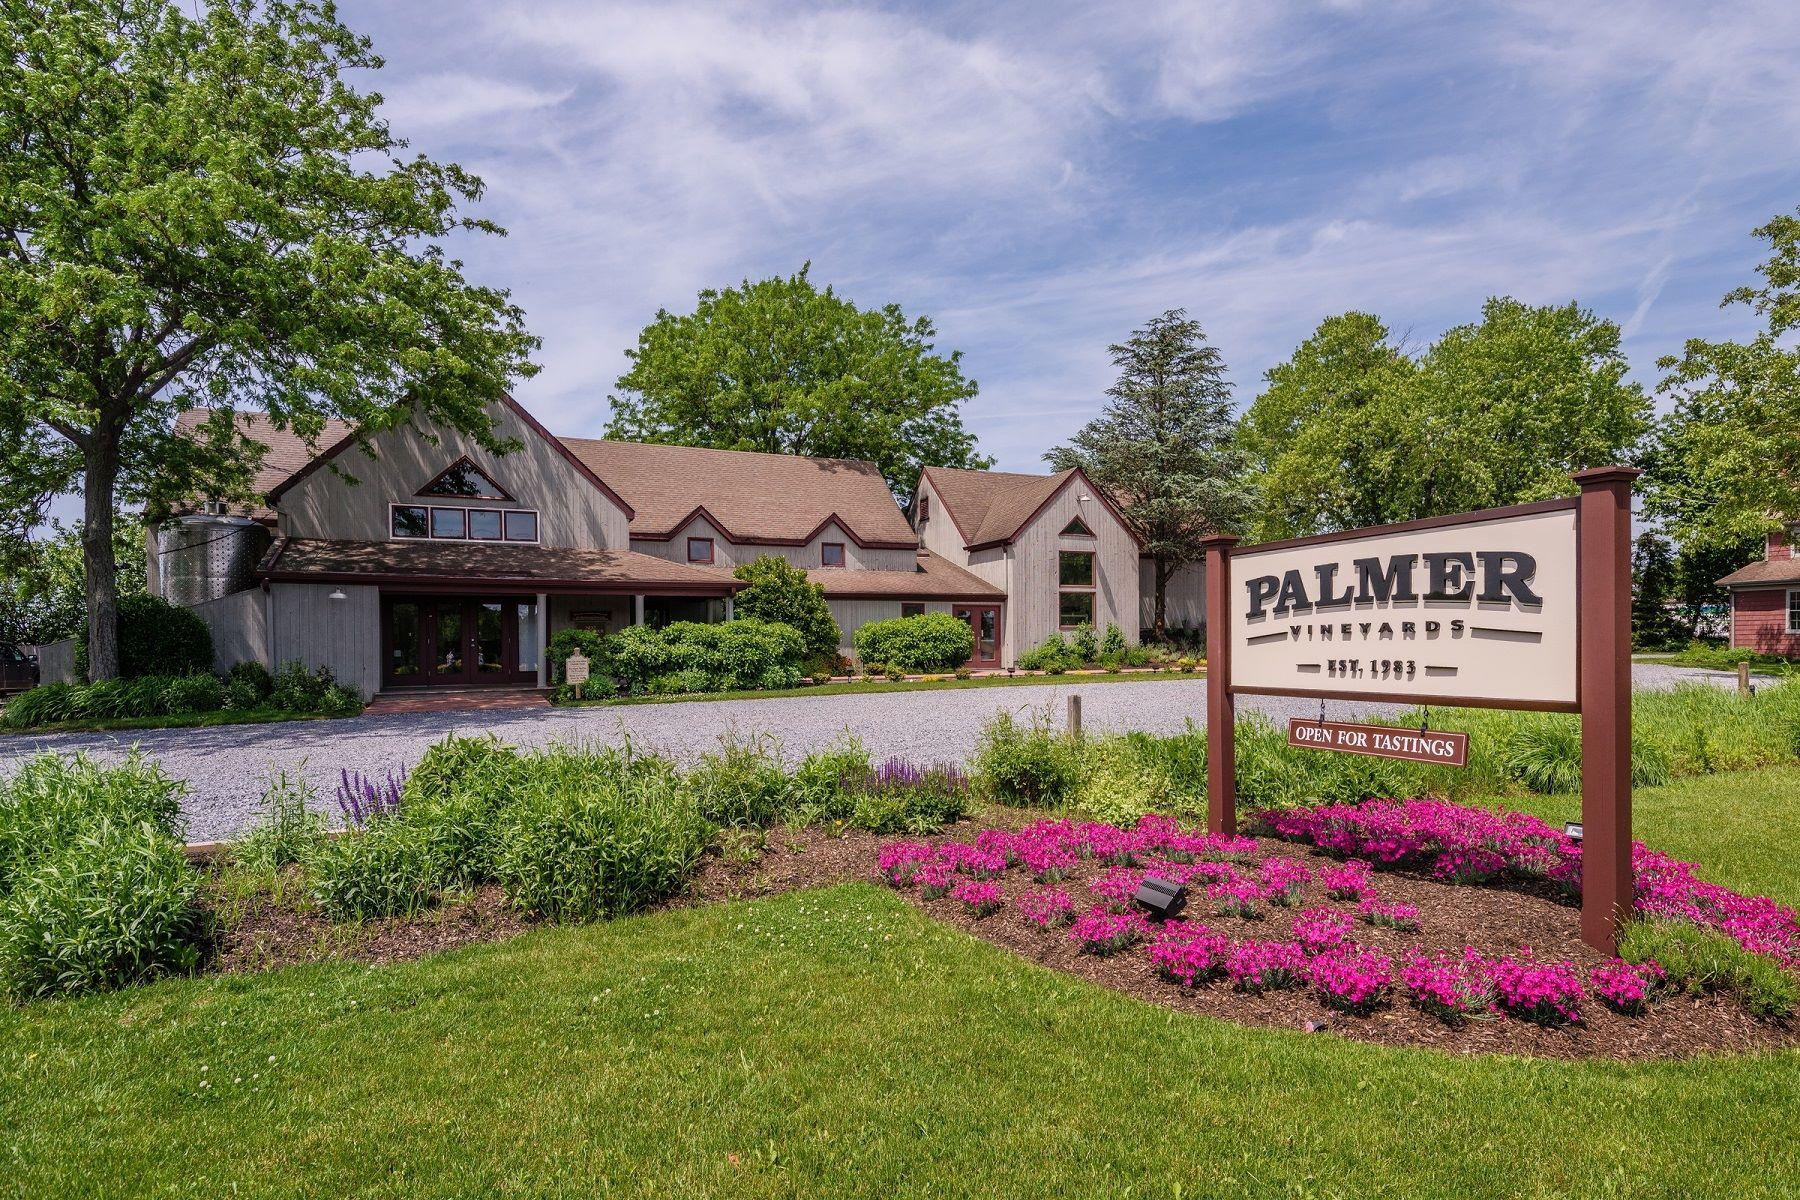 Vineyard for Sale at Palmer Vineyards 1 5120 Sound Ave Aquebogue, New York, 11931 United States